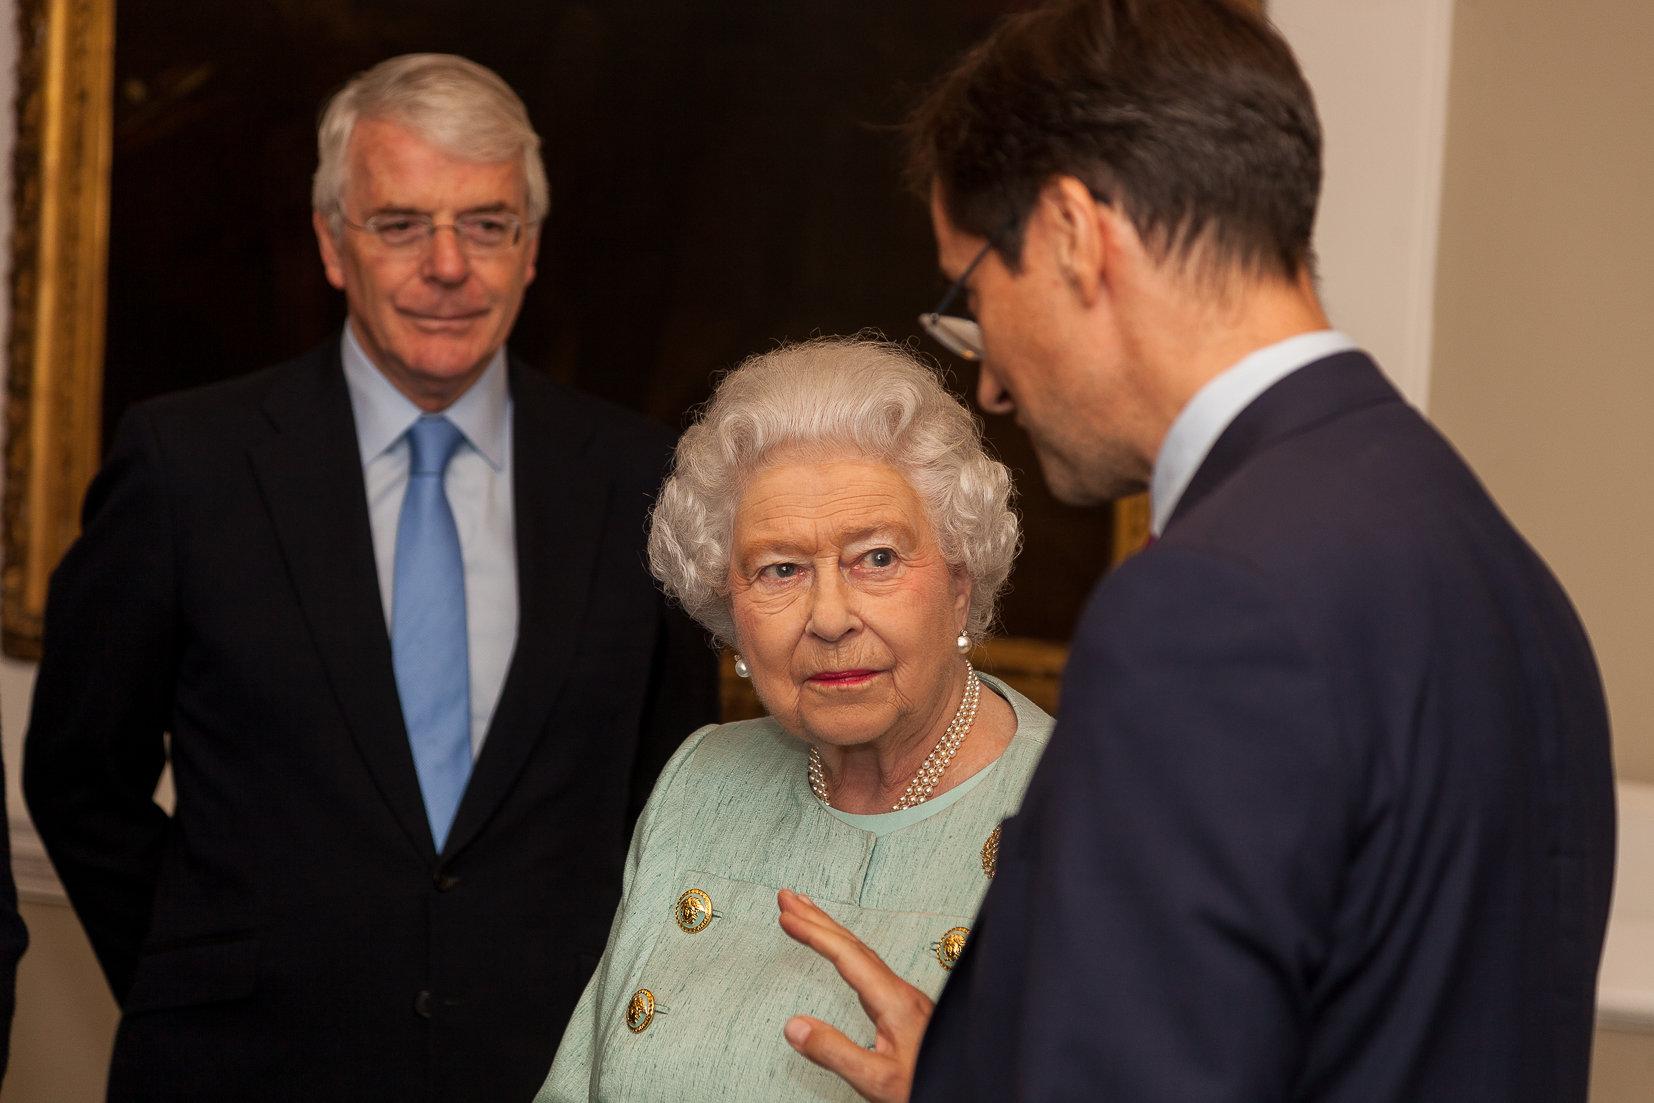 La Regina Elisabetta dice basta alle pellicce: vestirà solo capi sintetici